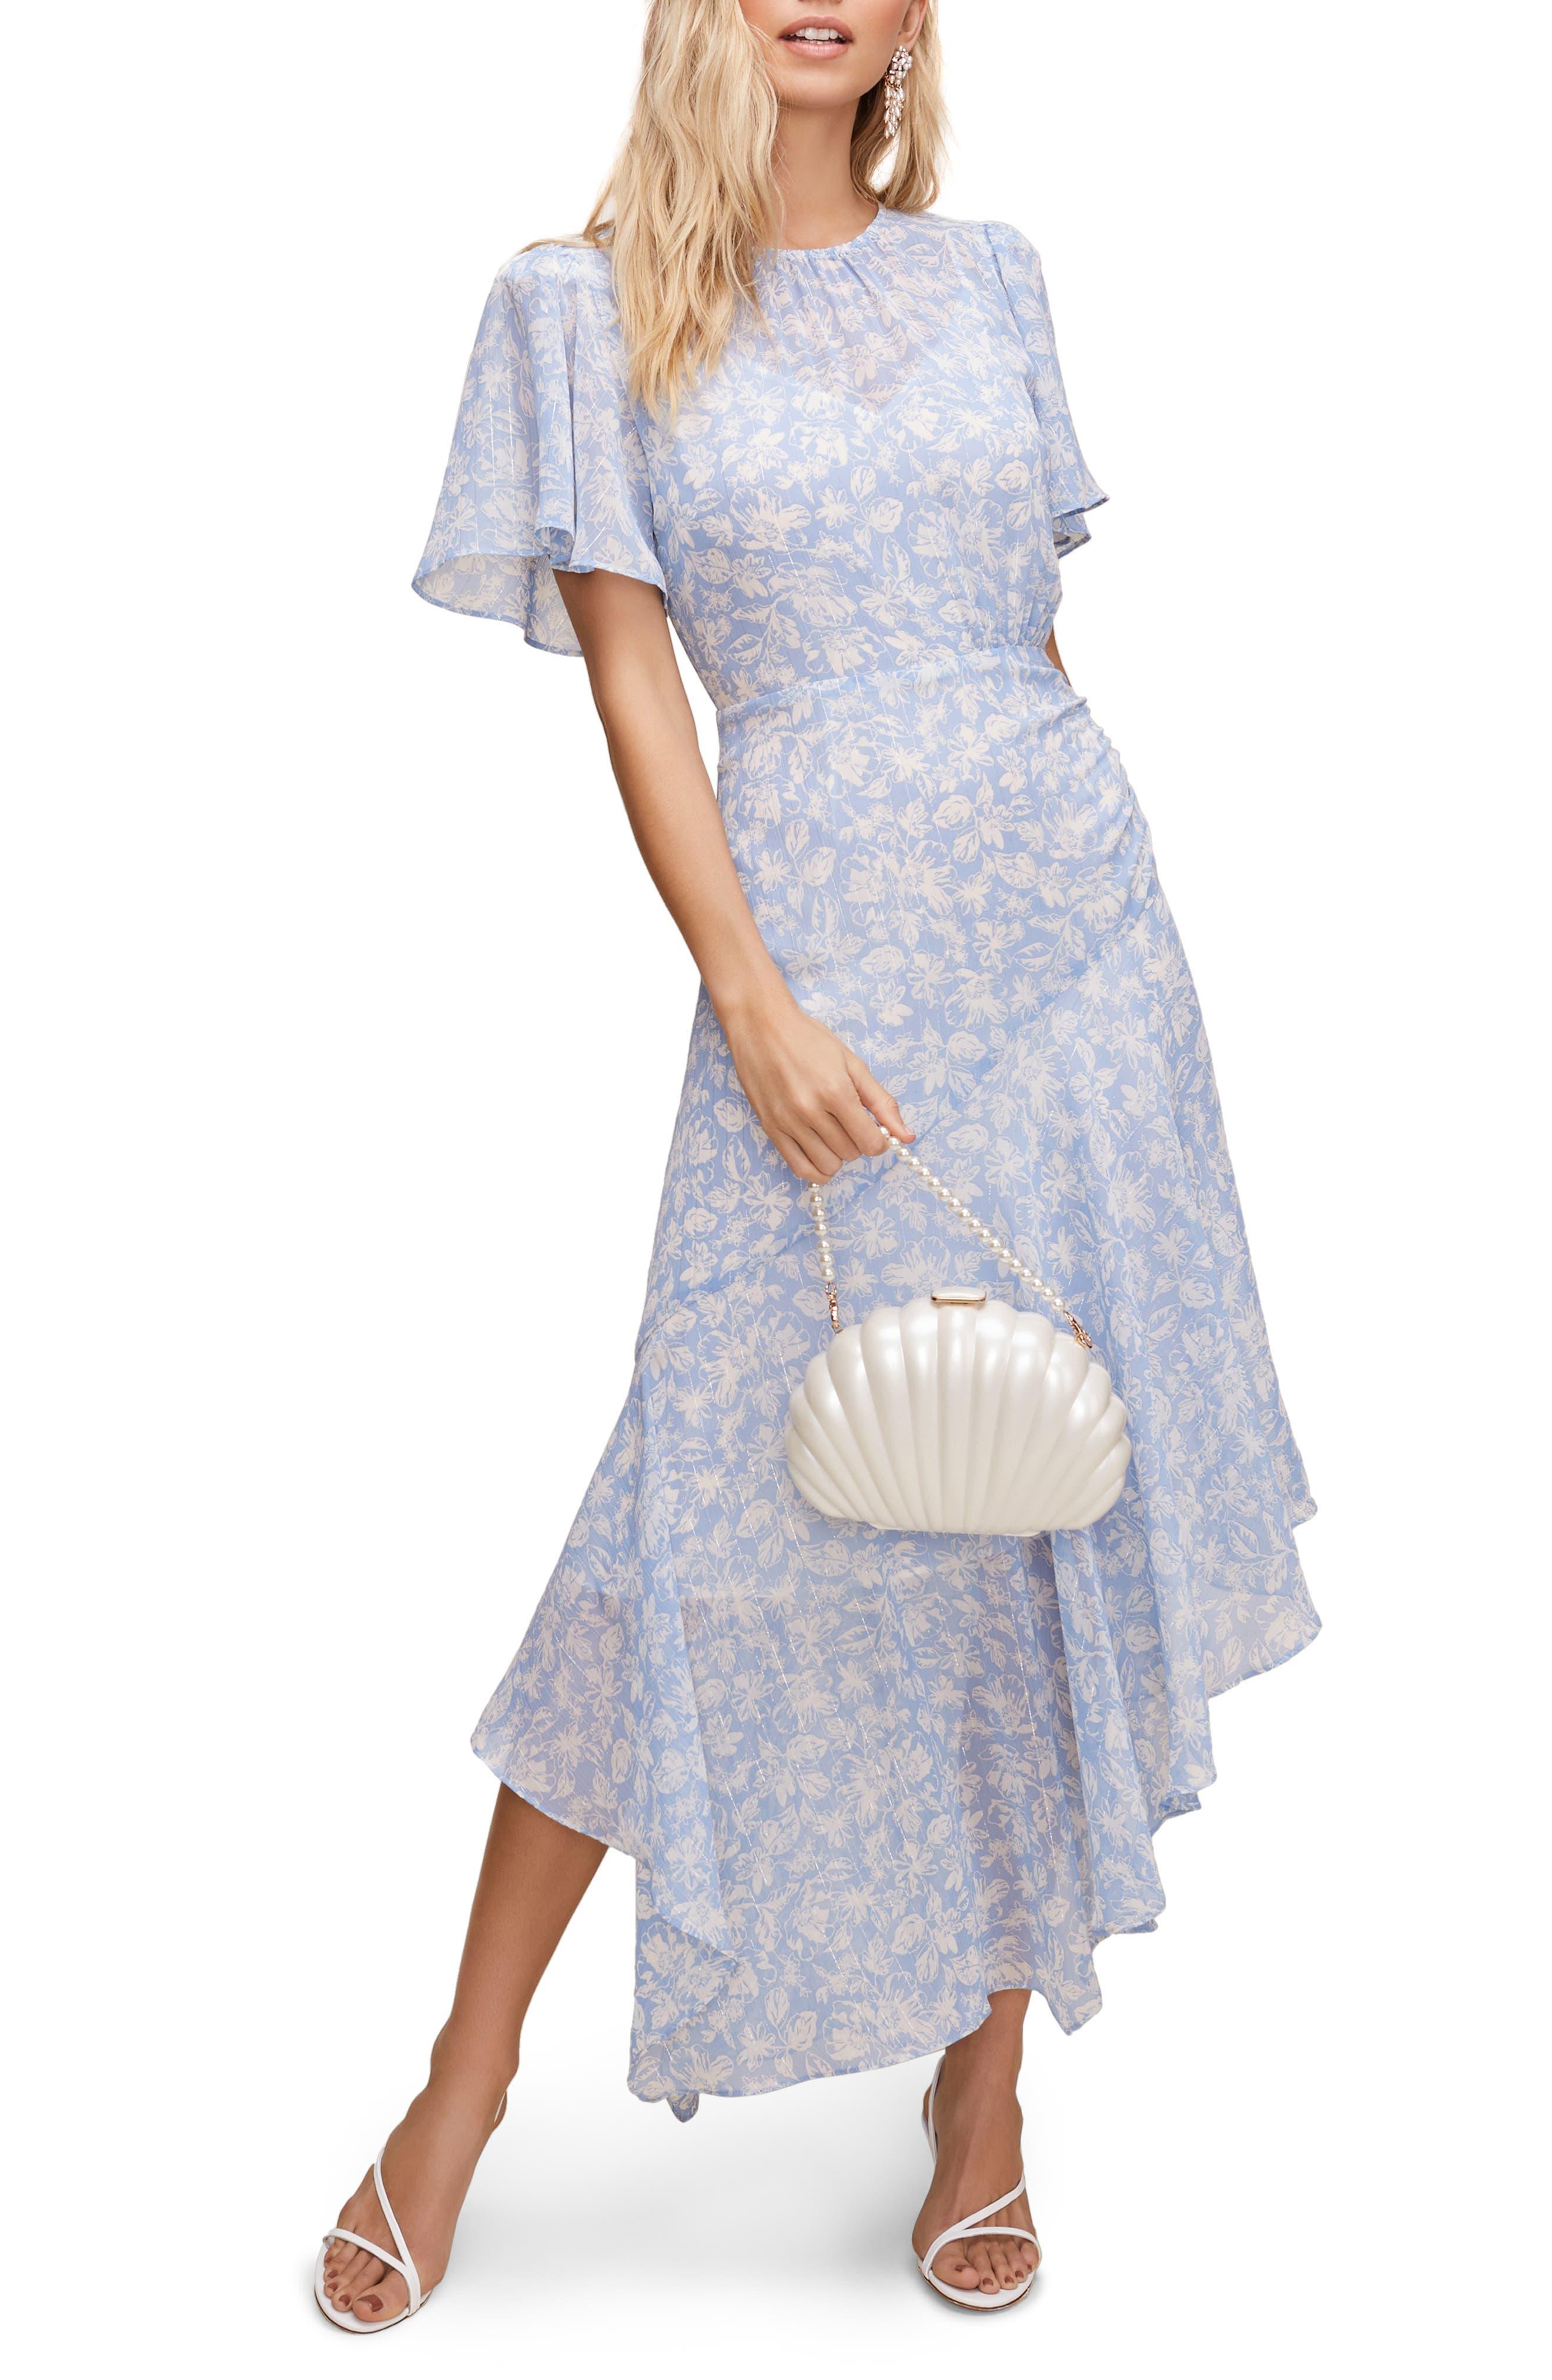 1920s Day Dresses, Tea Dresses, Mature Dresses with Sleeves Womens Astr The Label Floral Print Dress Size X-Large - Blue $53.40 AT vintagedancer.com